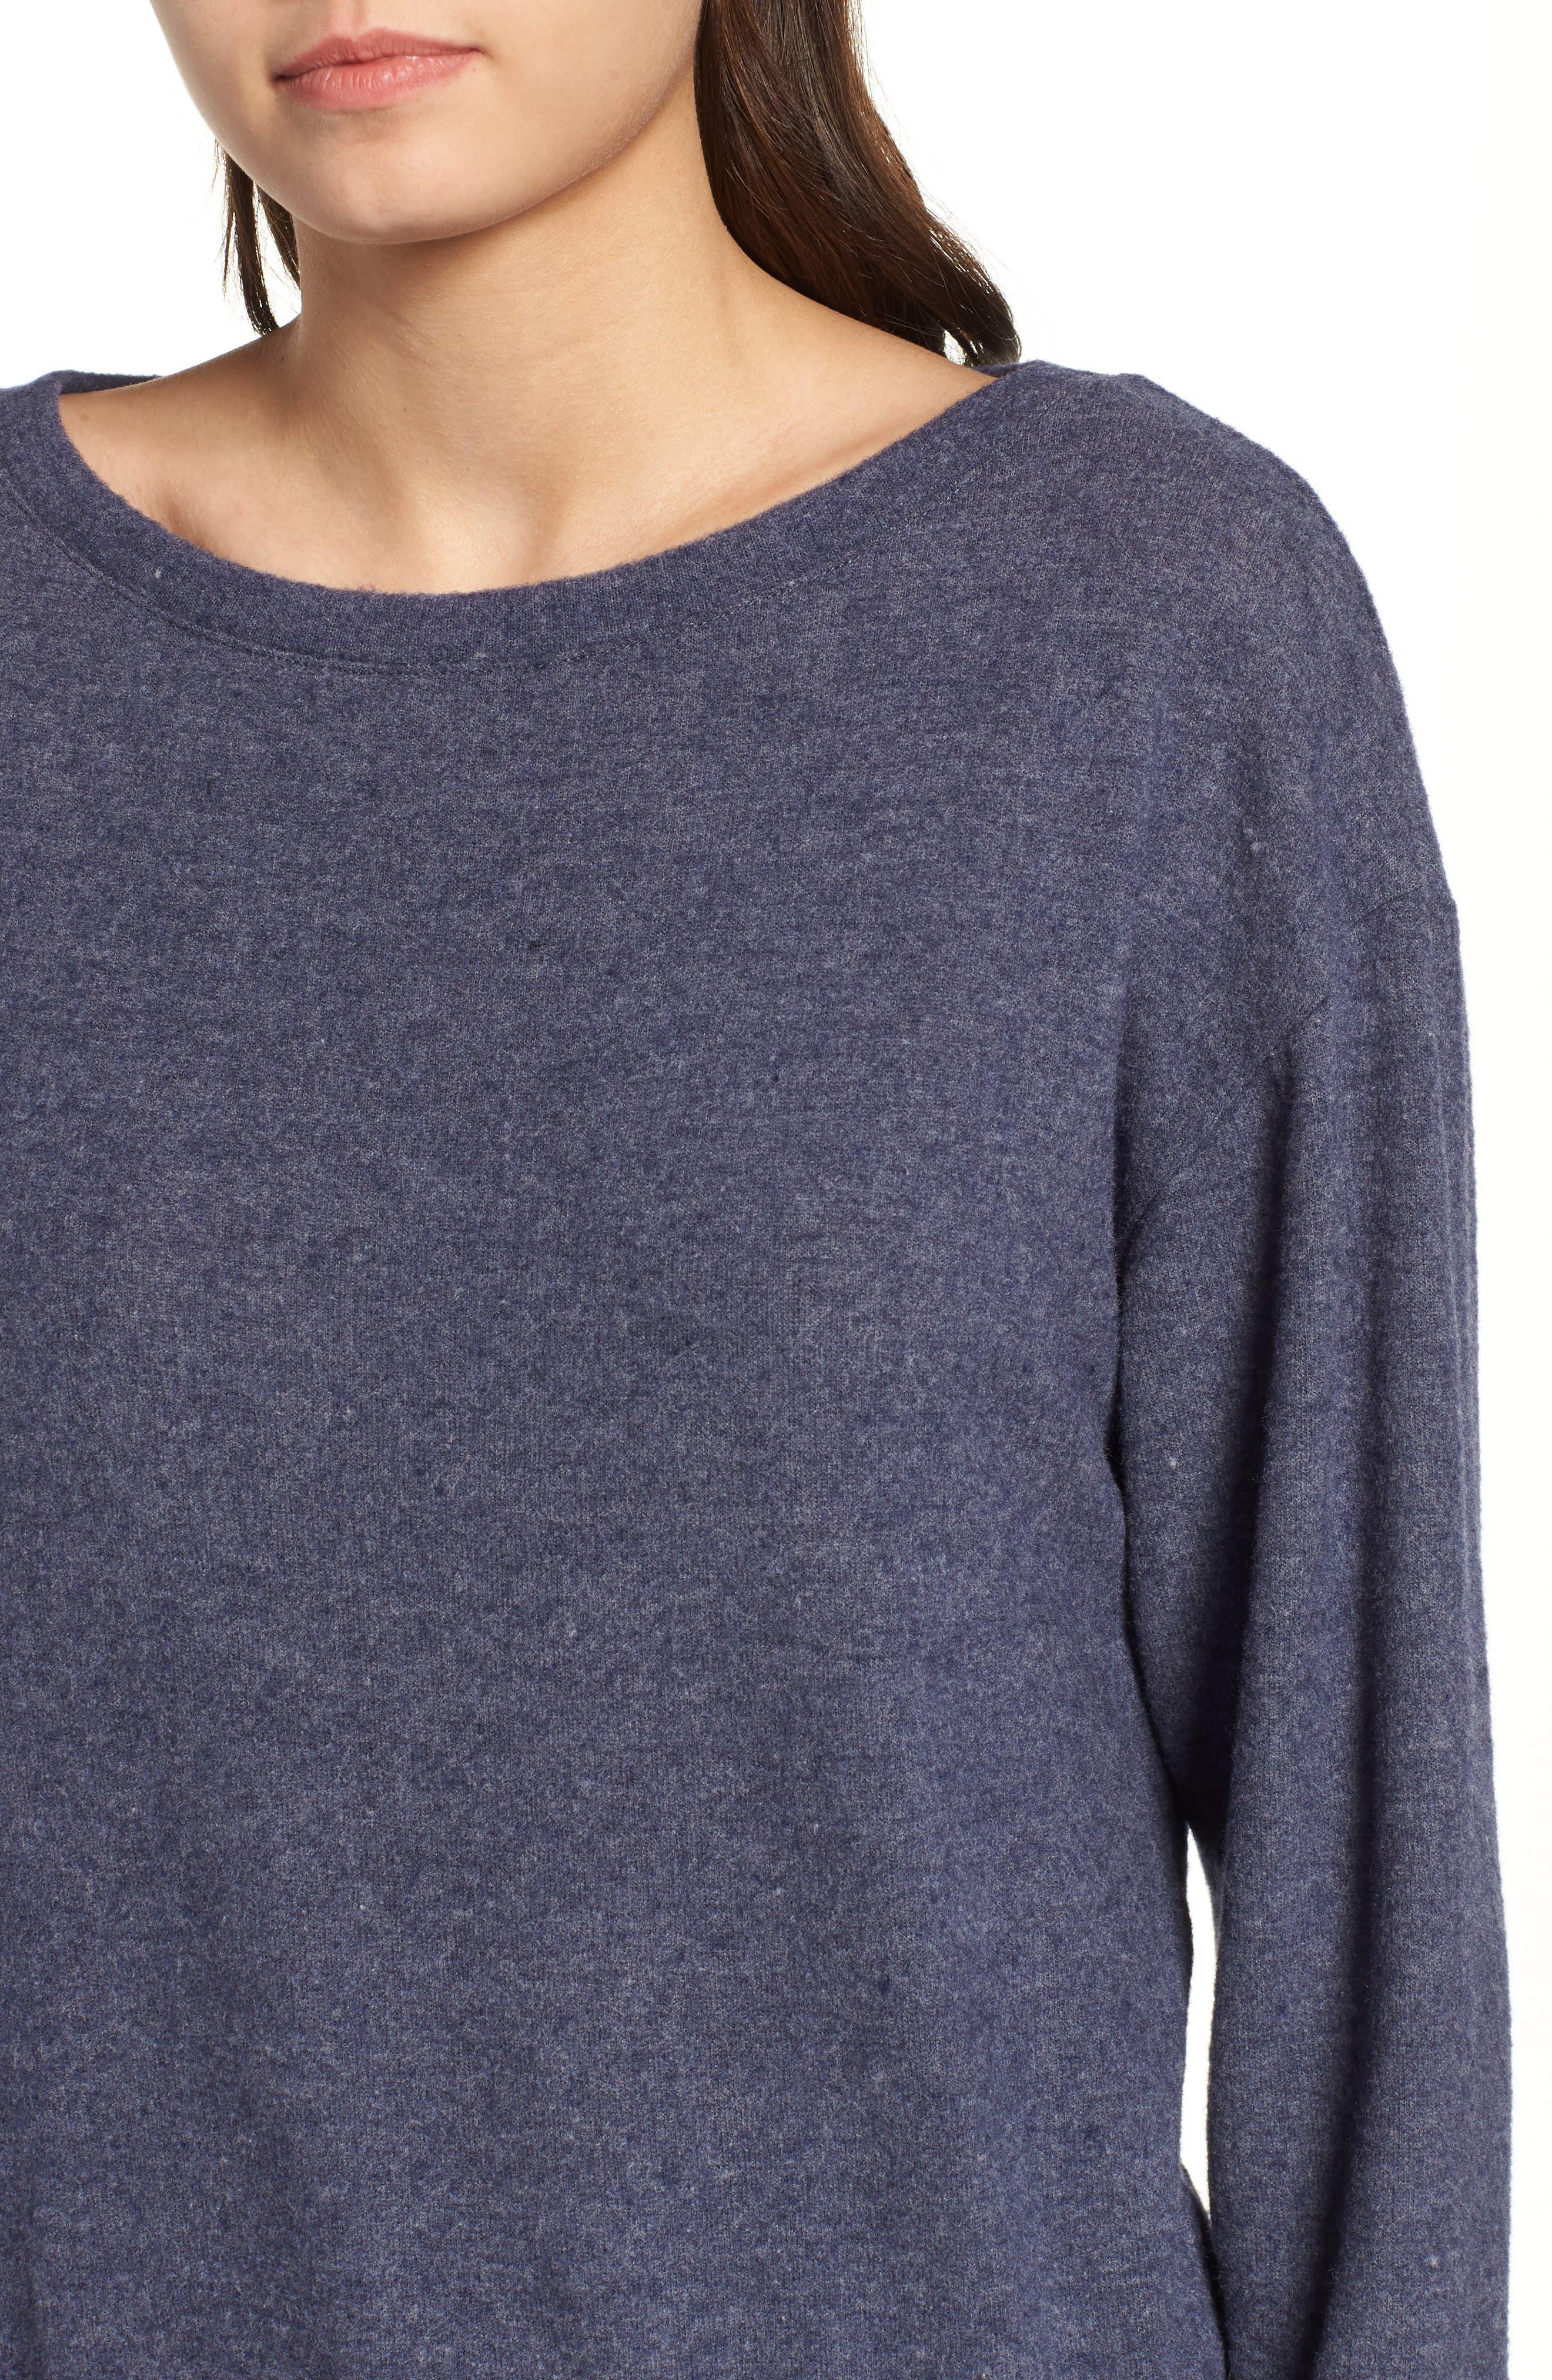 Keys Sweatshirt,                             Alternate thumbnail 4, color,                             HEATHER NAVY